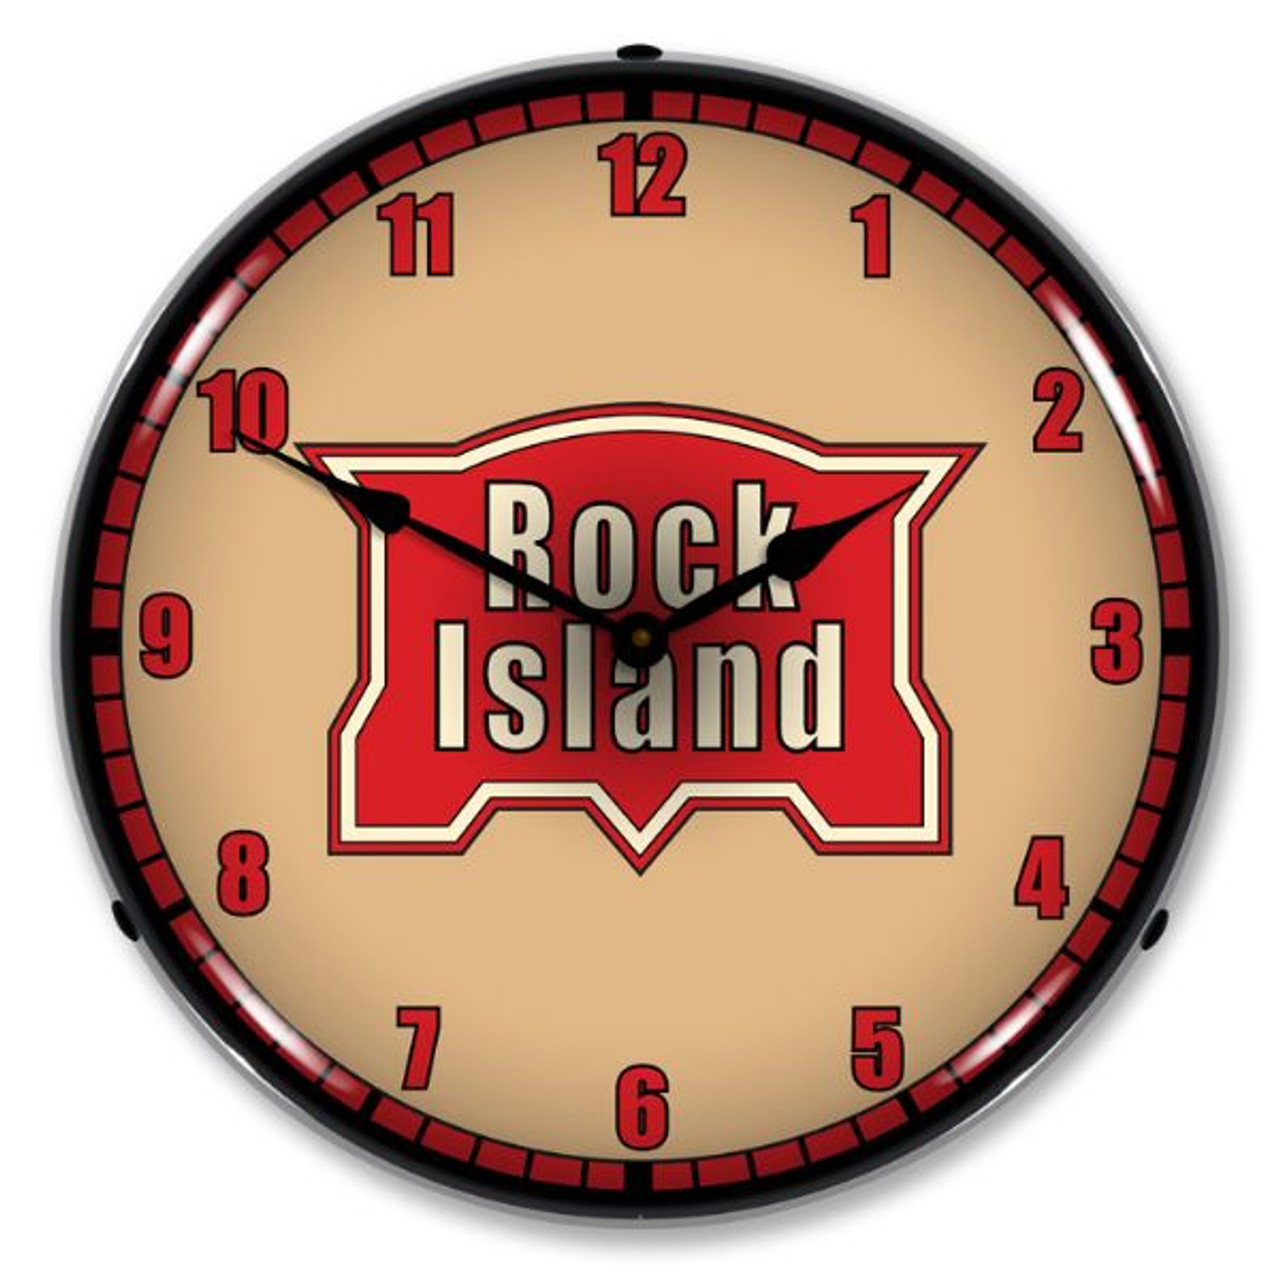 Rock Island Railroad Lighted Wall Clock